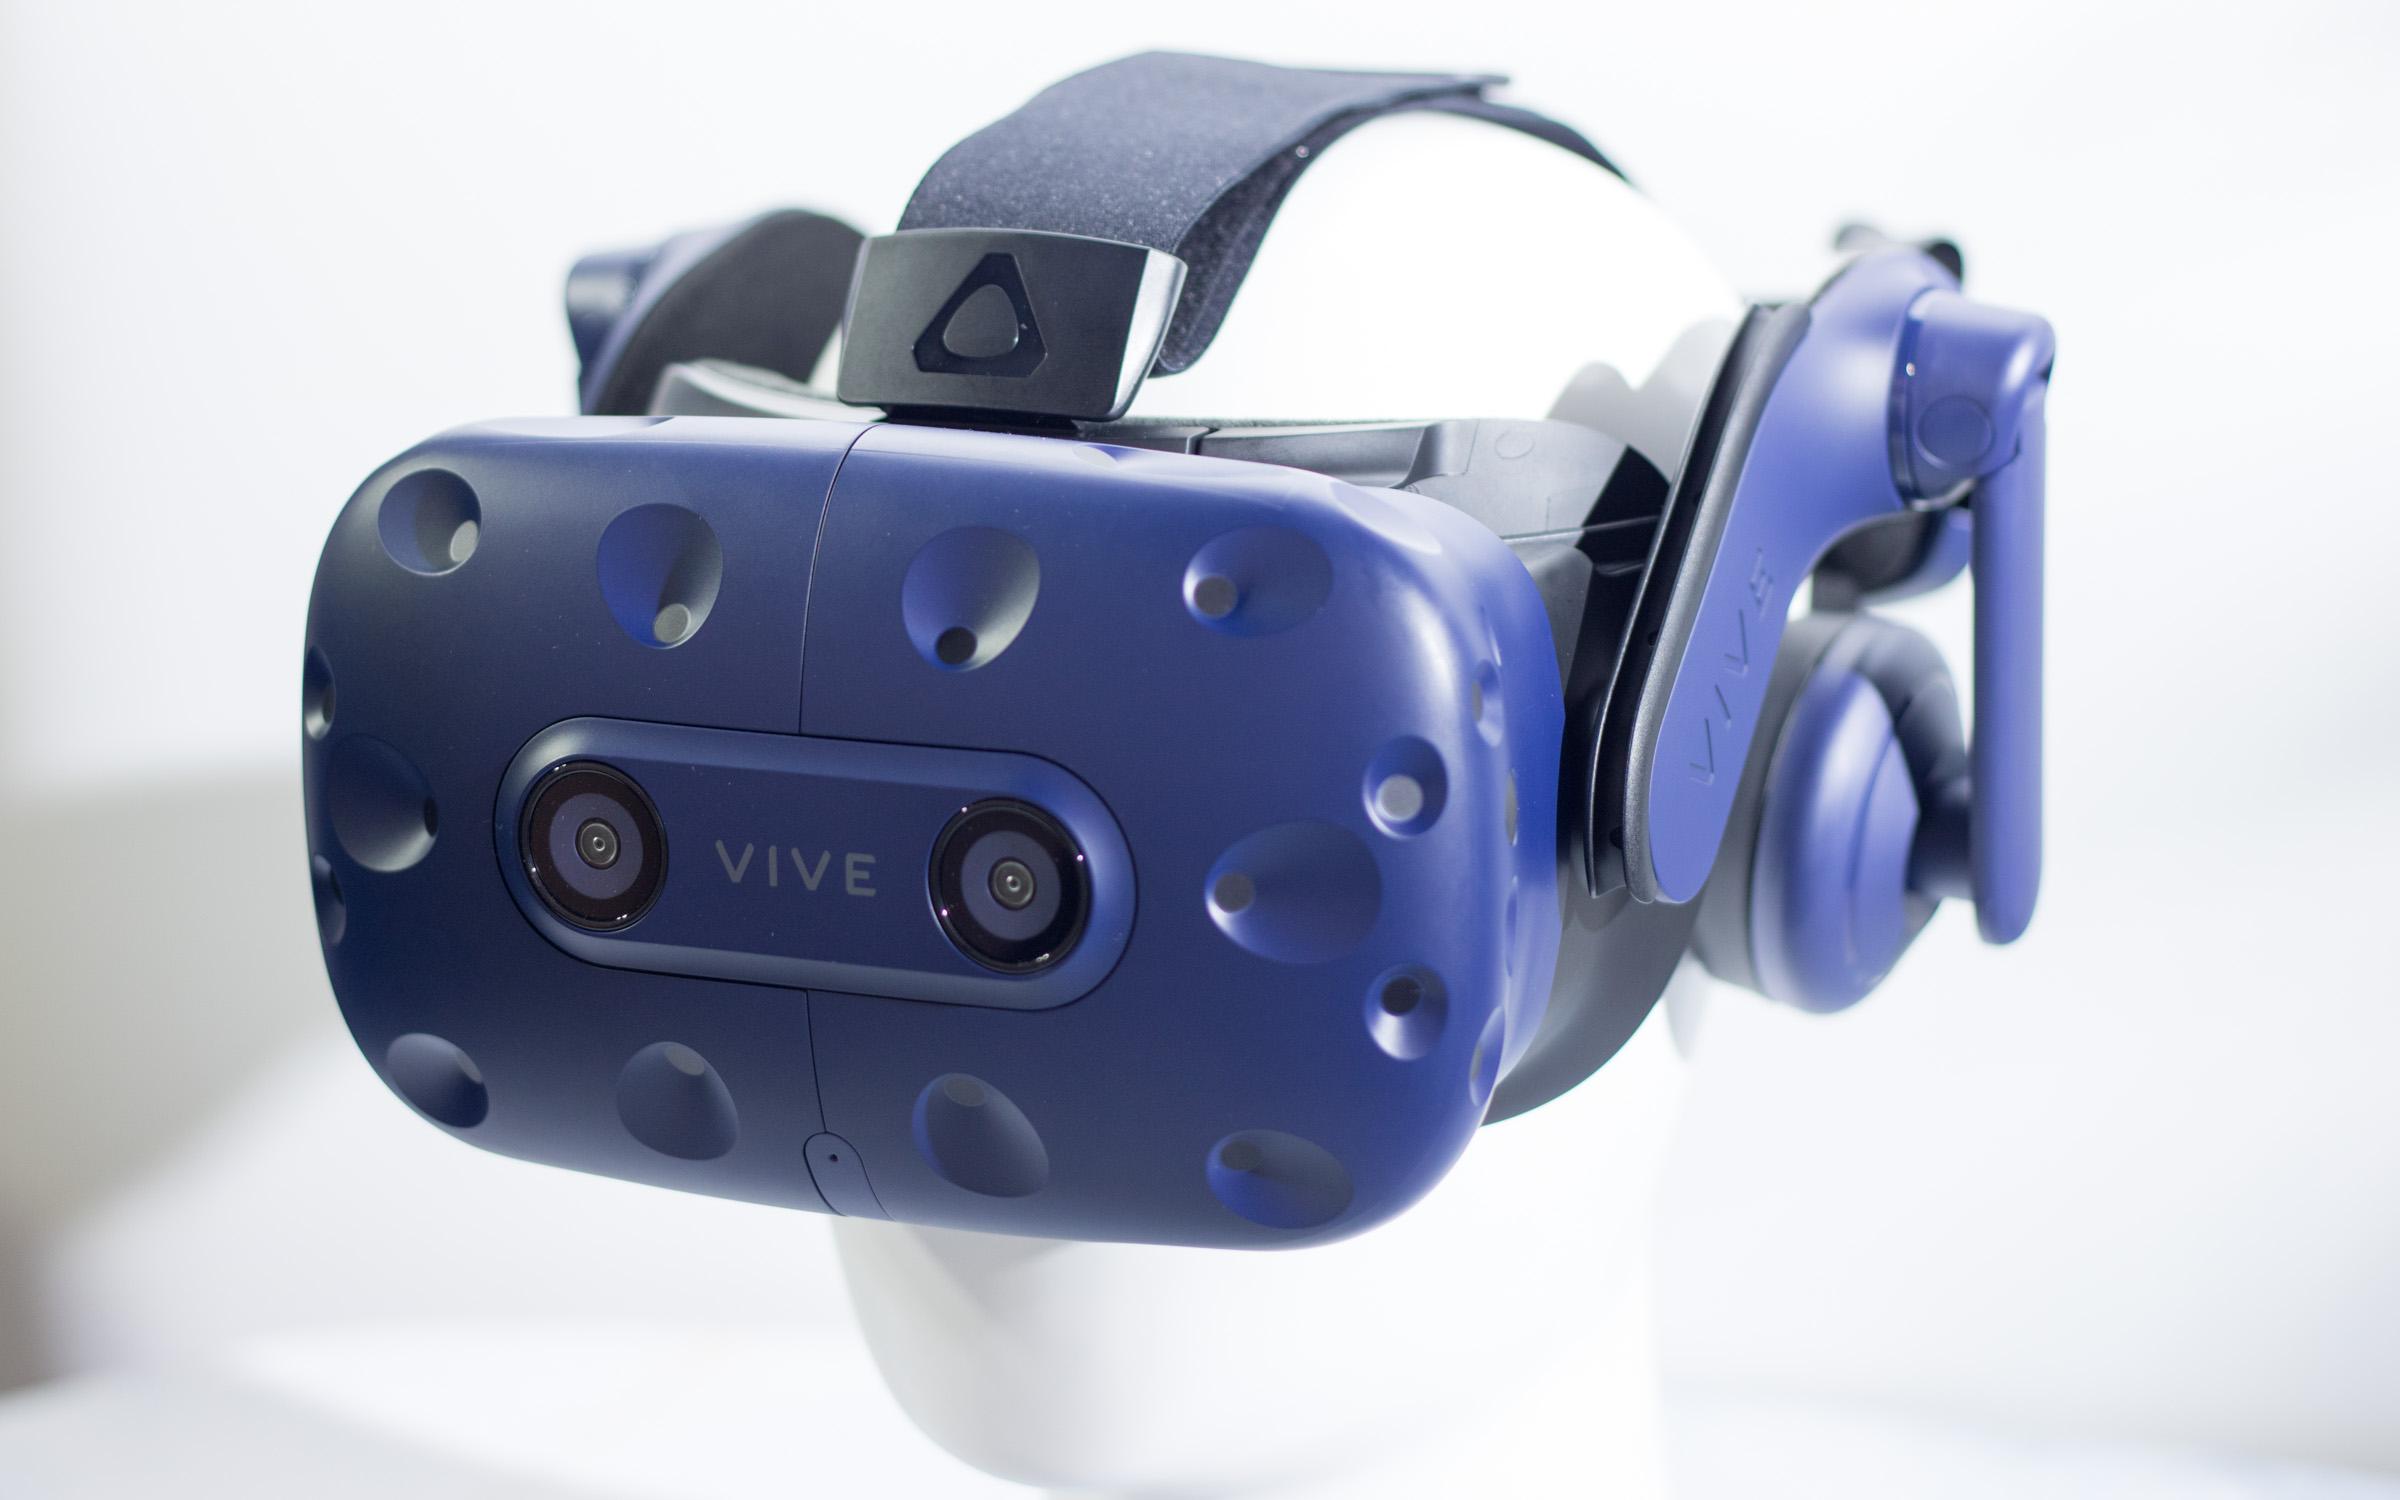 HTC Vive Pro 拆解:6488 元的售价,贵得「有理有据」